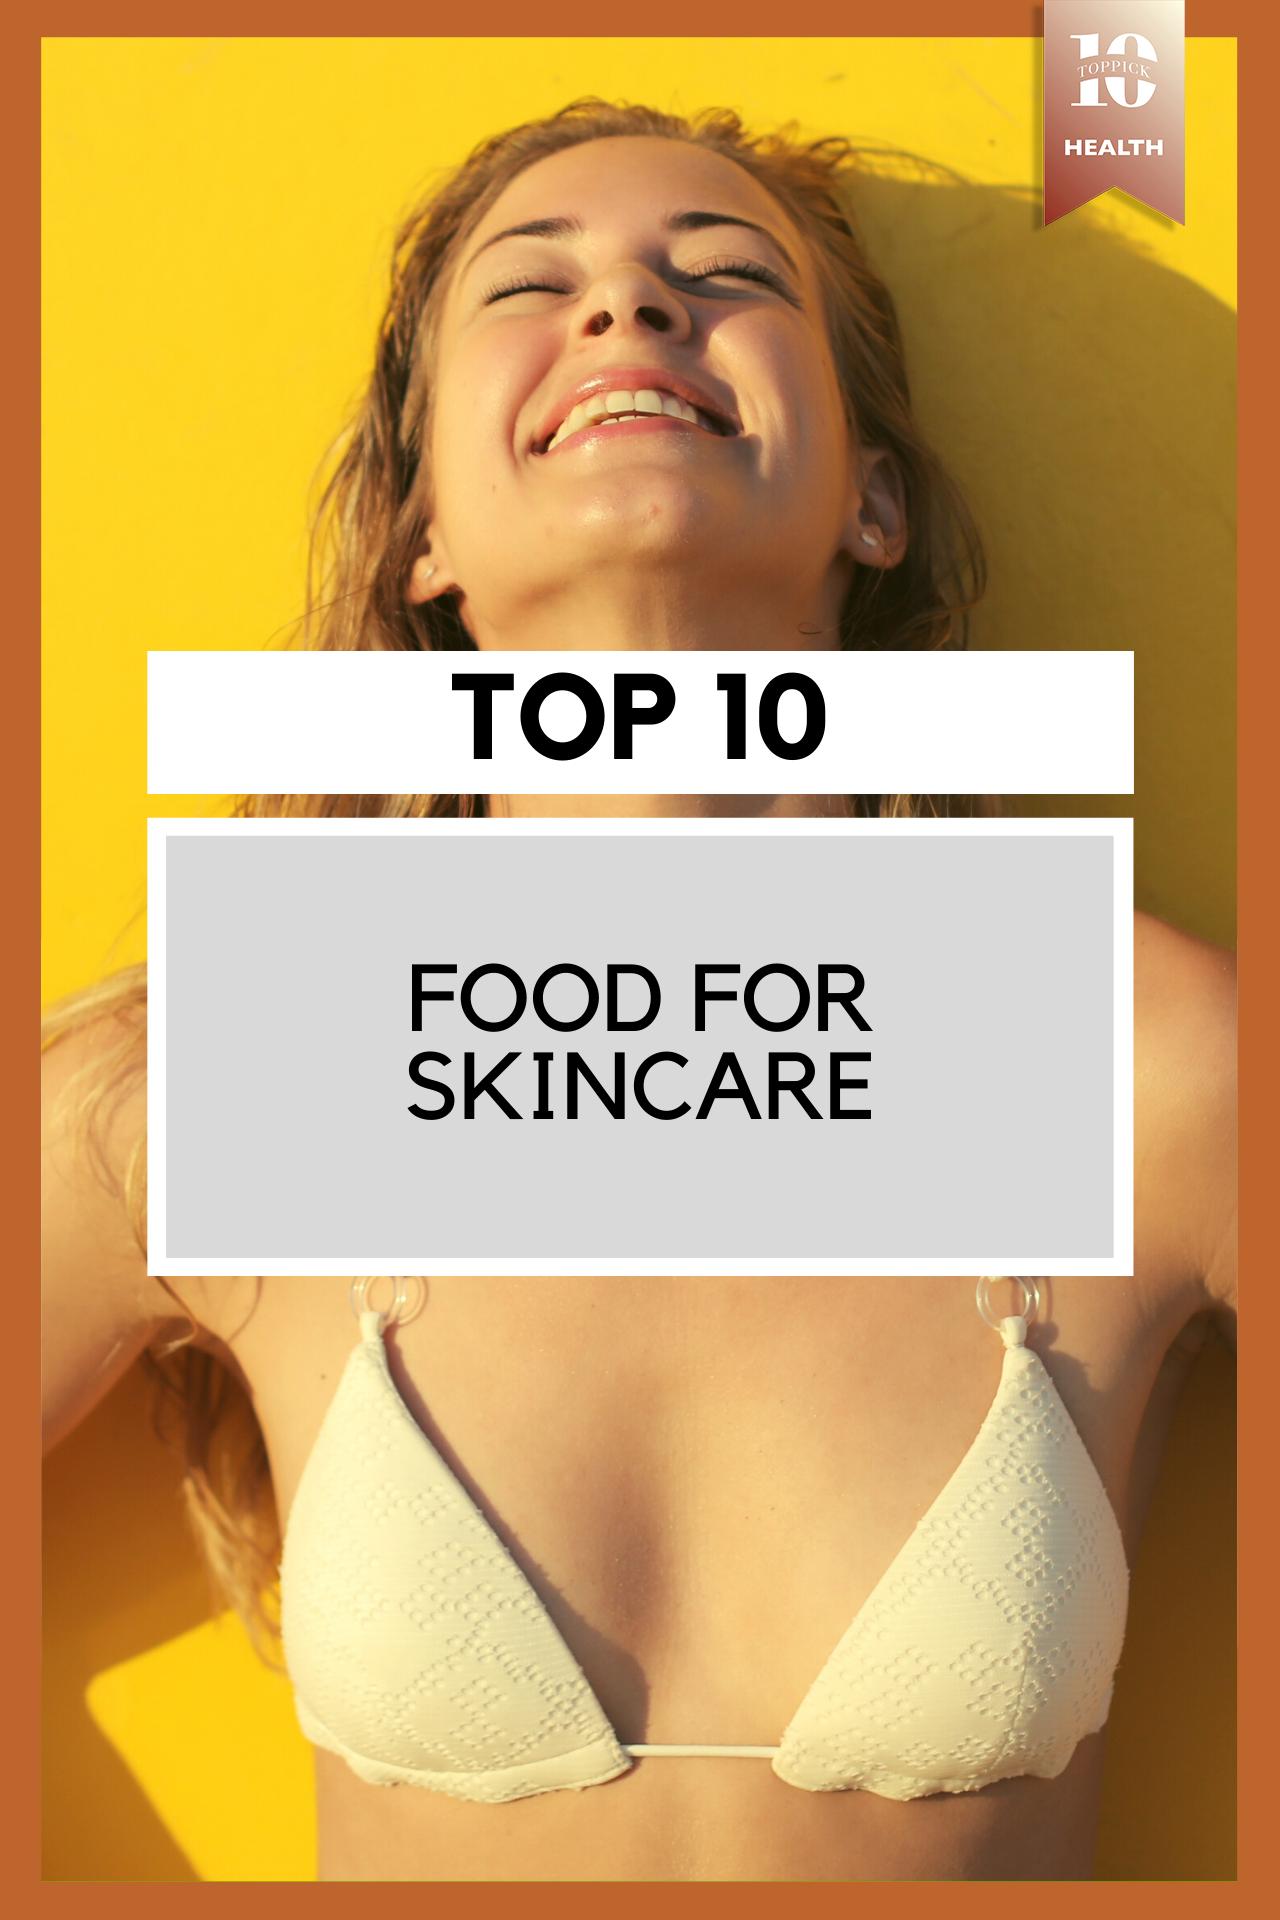 #healthyeating #skincare #skincareroutine #healthyskin #beauty #naturalbeauty #glowingskin